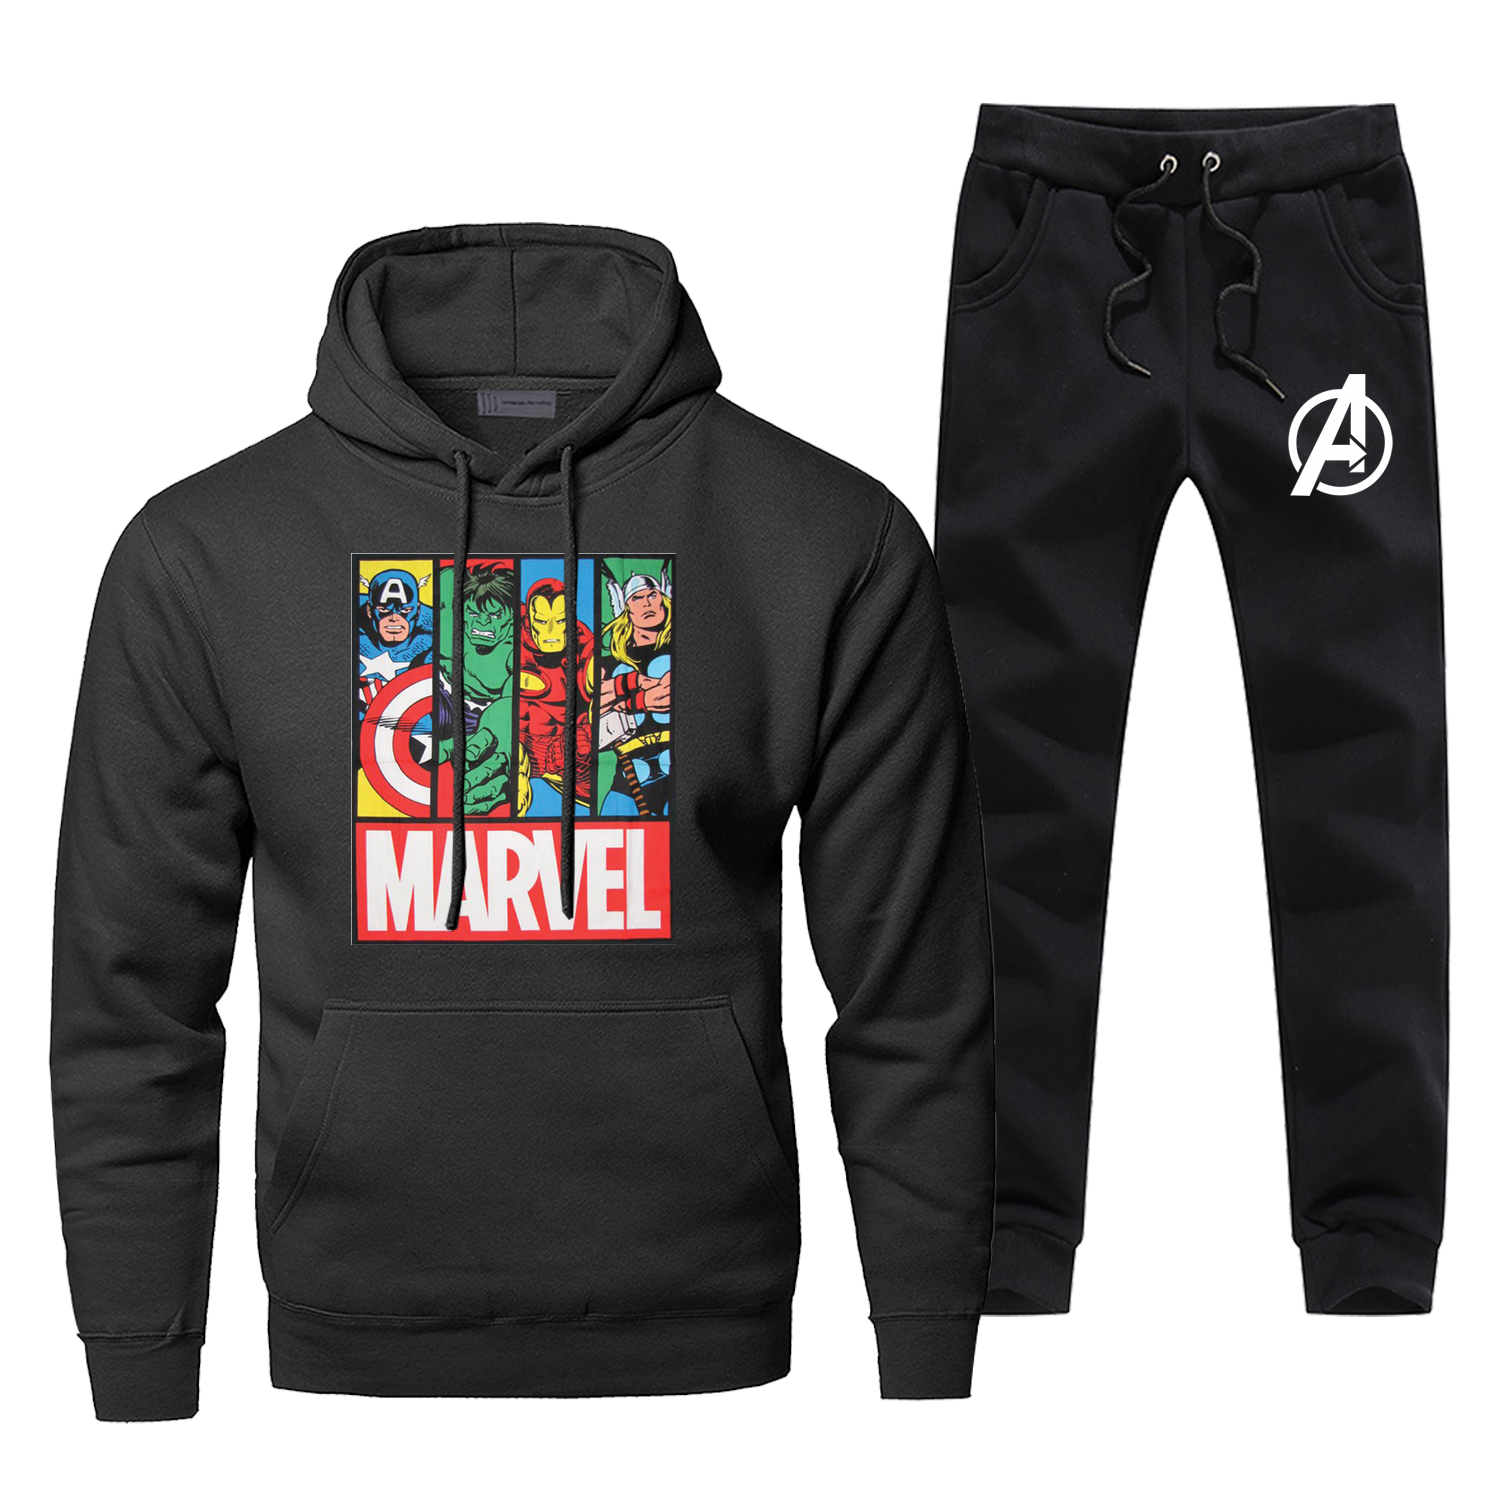 Super Hero Print Men's Sets Avengers Marvel Comic Casual Sportsman Wear 2019 New Fashion Fleece Fitness Winter Pants Sweatshirts